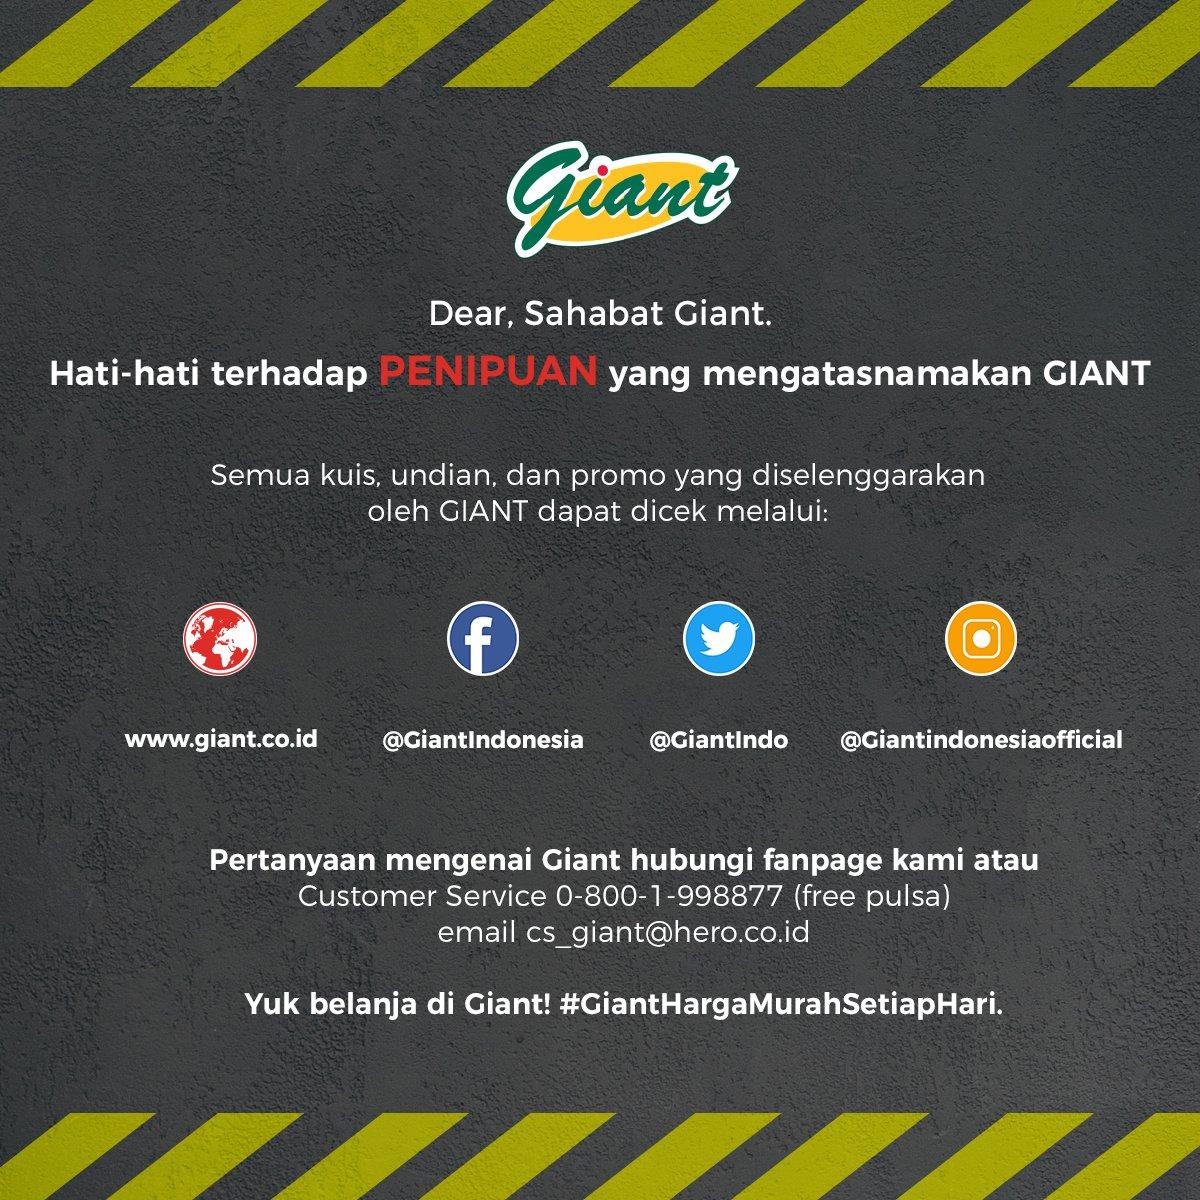 Dear, Sahabat Giant.  Hati-hati terhadap penipuan yang mengatasnamakan GIANT.  Semua kuis, undian, dan promo yang diselenggarakan oleh GIANT dapat dicek melalu fanpage Giant atau klik http://www.giant.co.id  #GiantHargaMurahSetiapHari